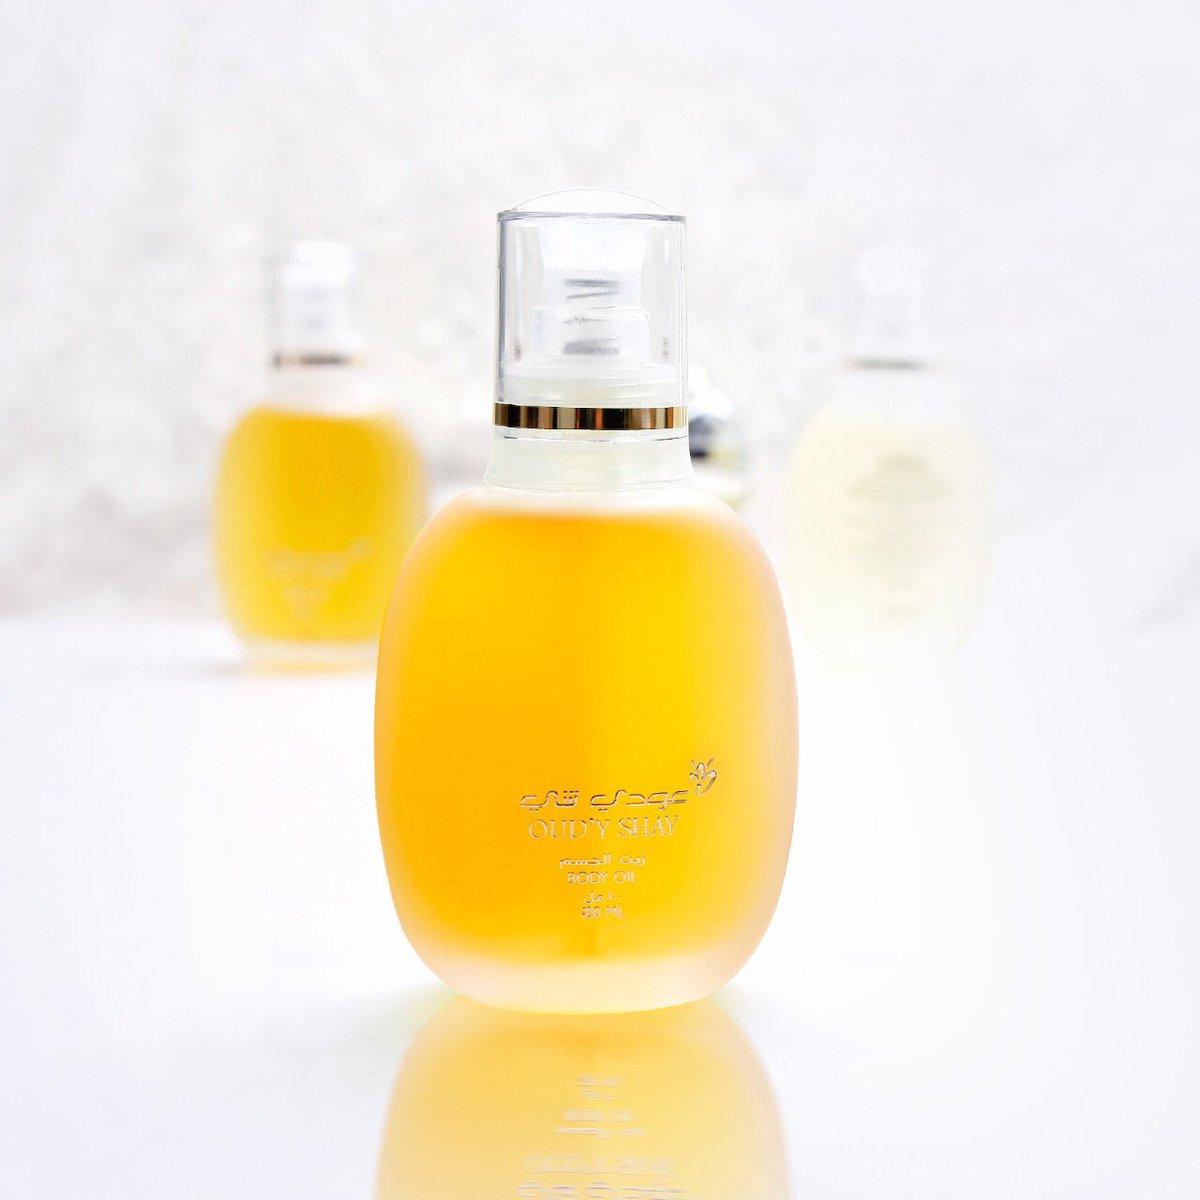 a93c05f7e استخدم زيت عودي شي لبشرة ناعمة و صحية For a smoother, healthier skin, Oudy